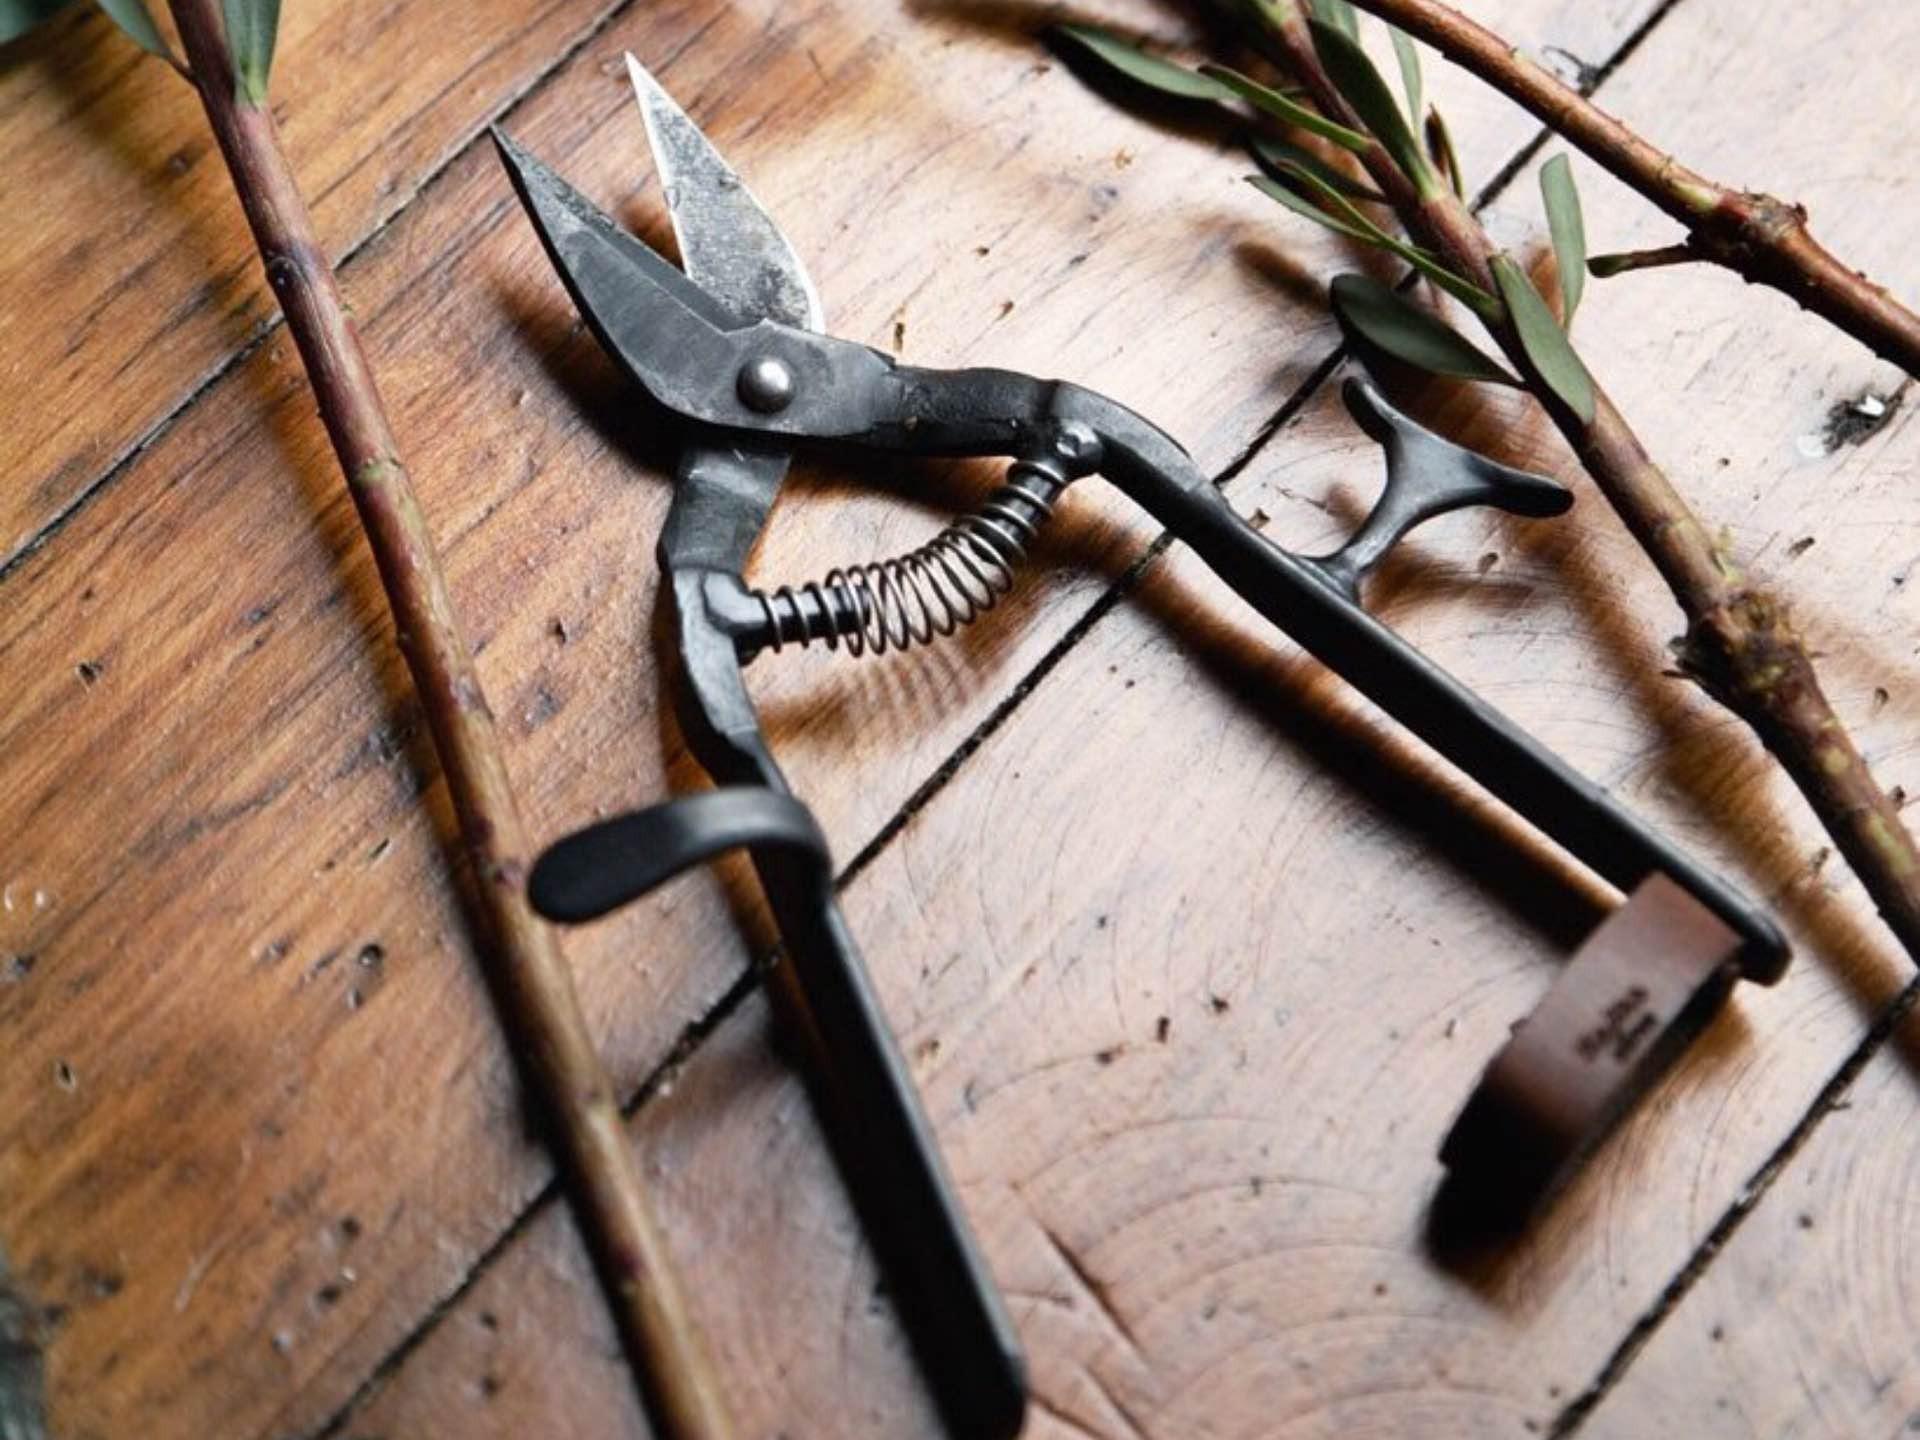 Tajika Haruo Ironworks garden clippers. ($210)